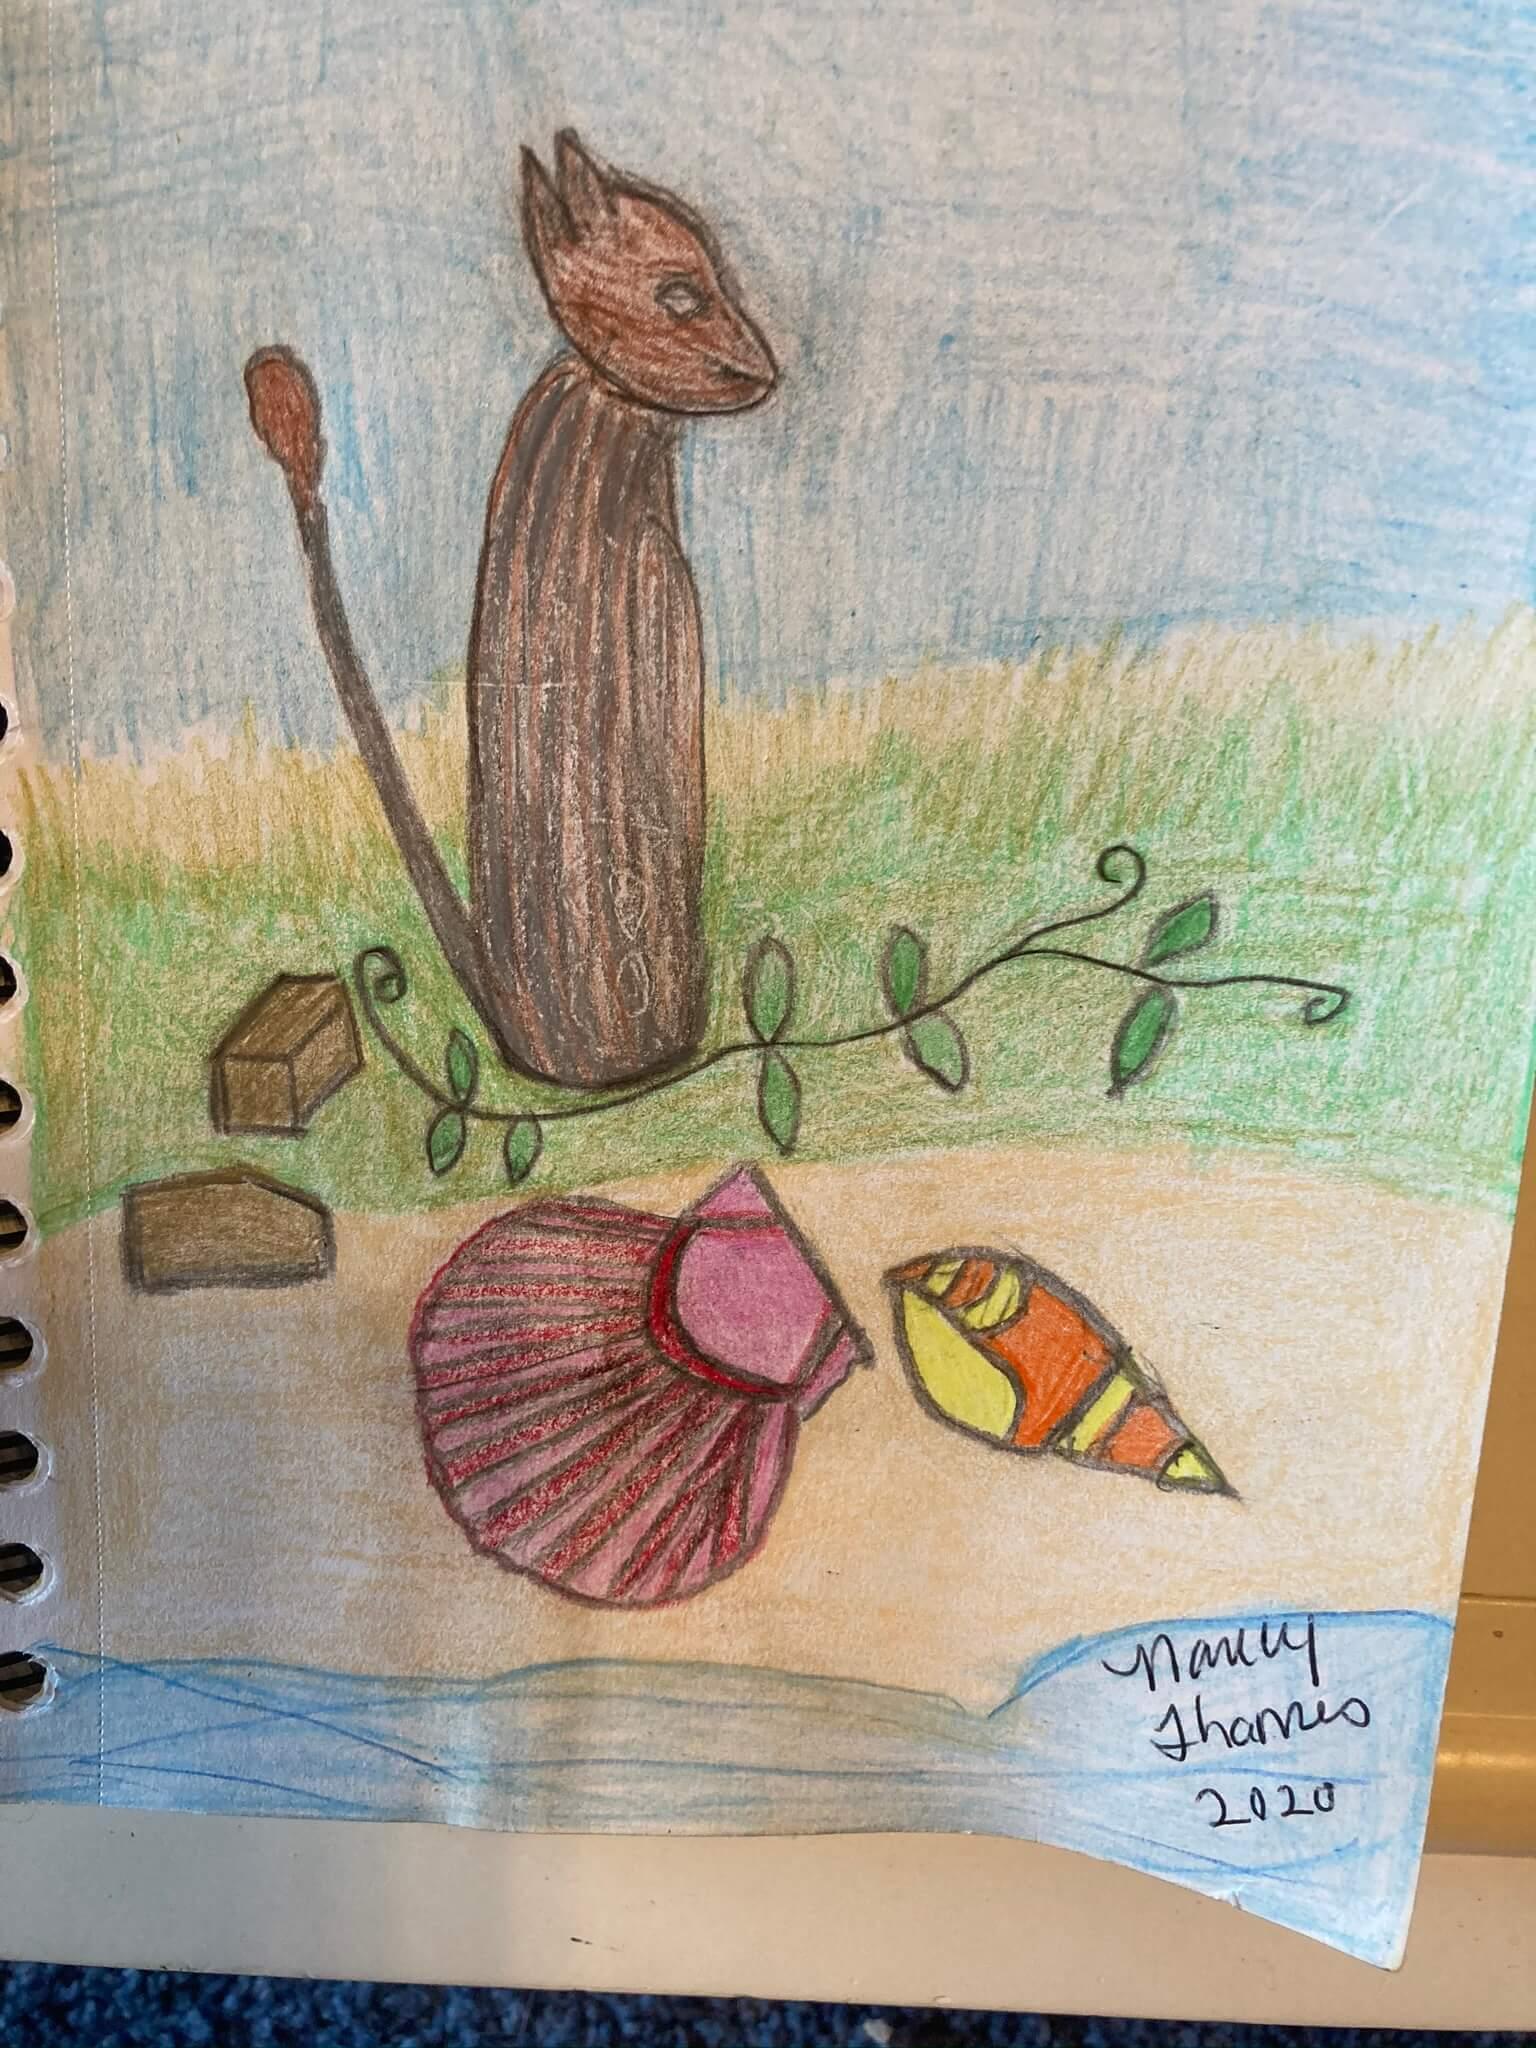 My Drawing of A Alien Species